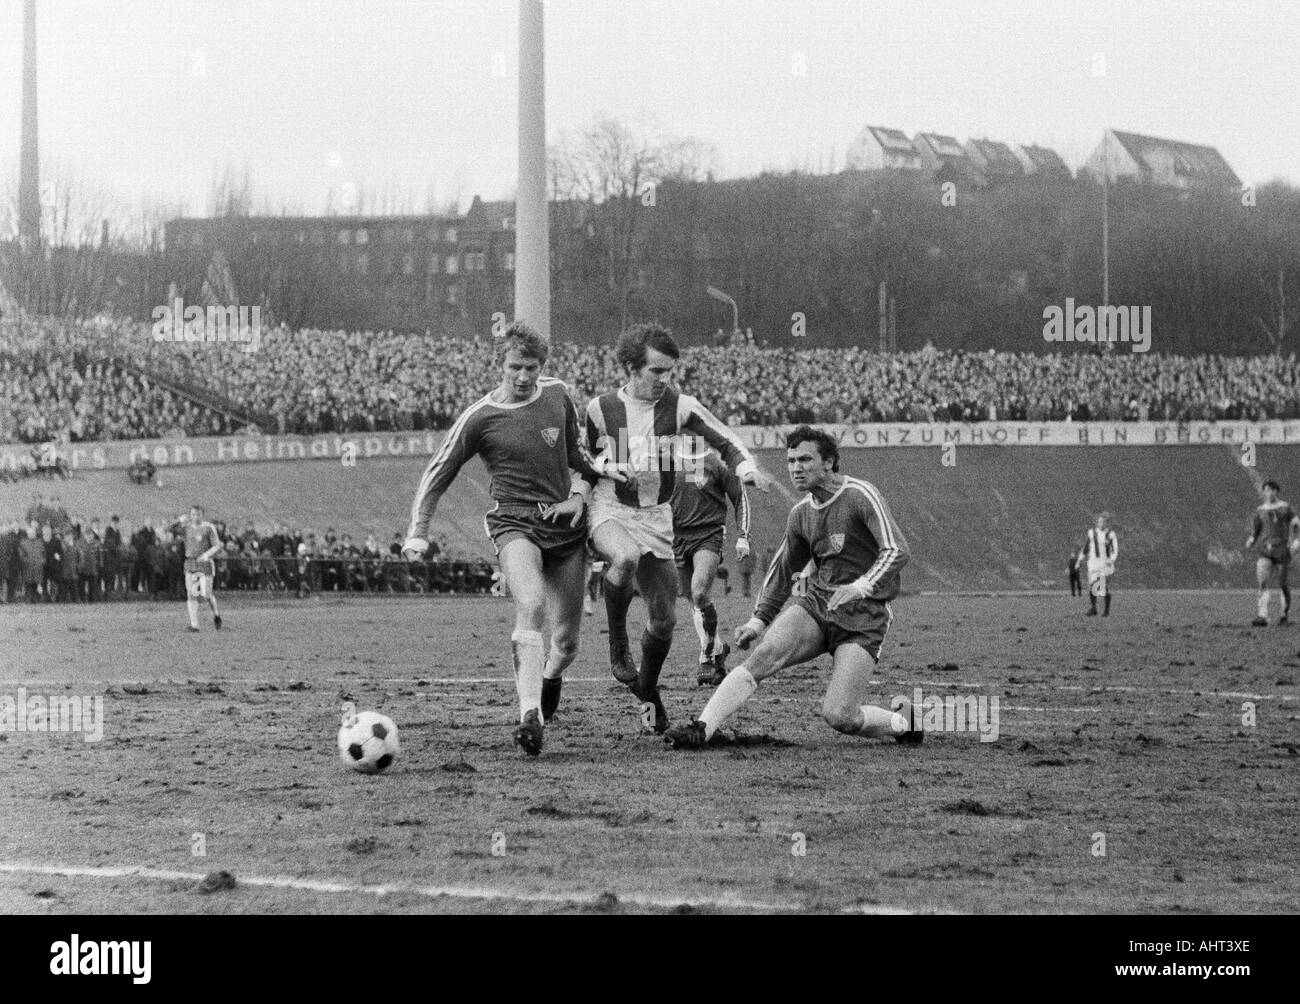 football, Regionalliga West, 1970/1971, Stadium am Zoo in Wuppertal, Wuppertaler SV versus VfL Bochum 2:1, scene of the match, f.l.t.r. Manfred Ruesing (VfL), Gustav Jung (WSV), Erwin Galeski (VfL) - Stock Image